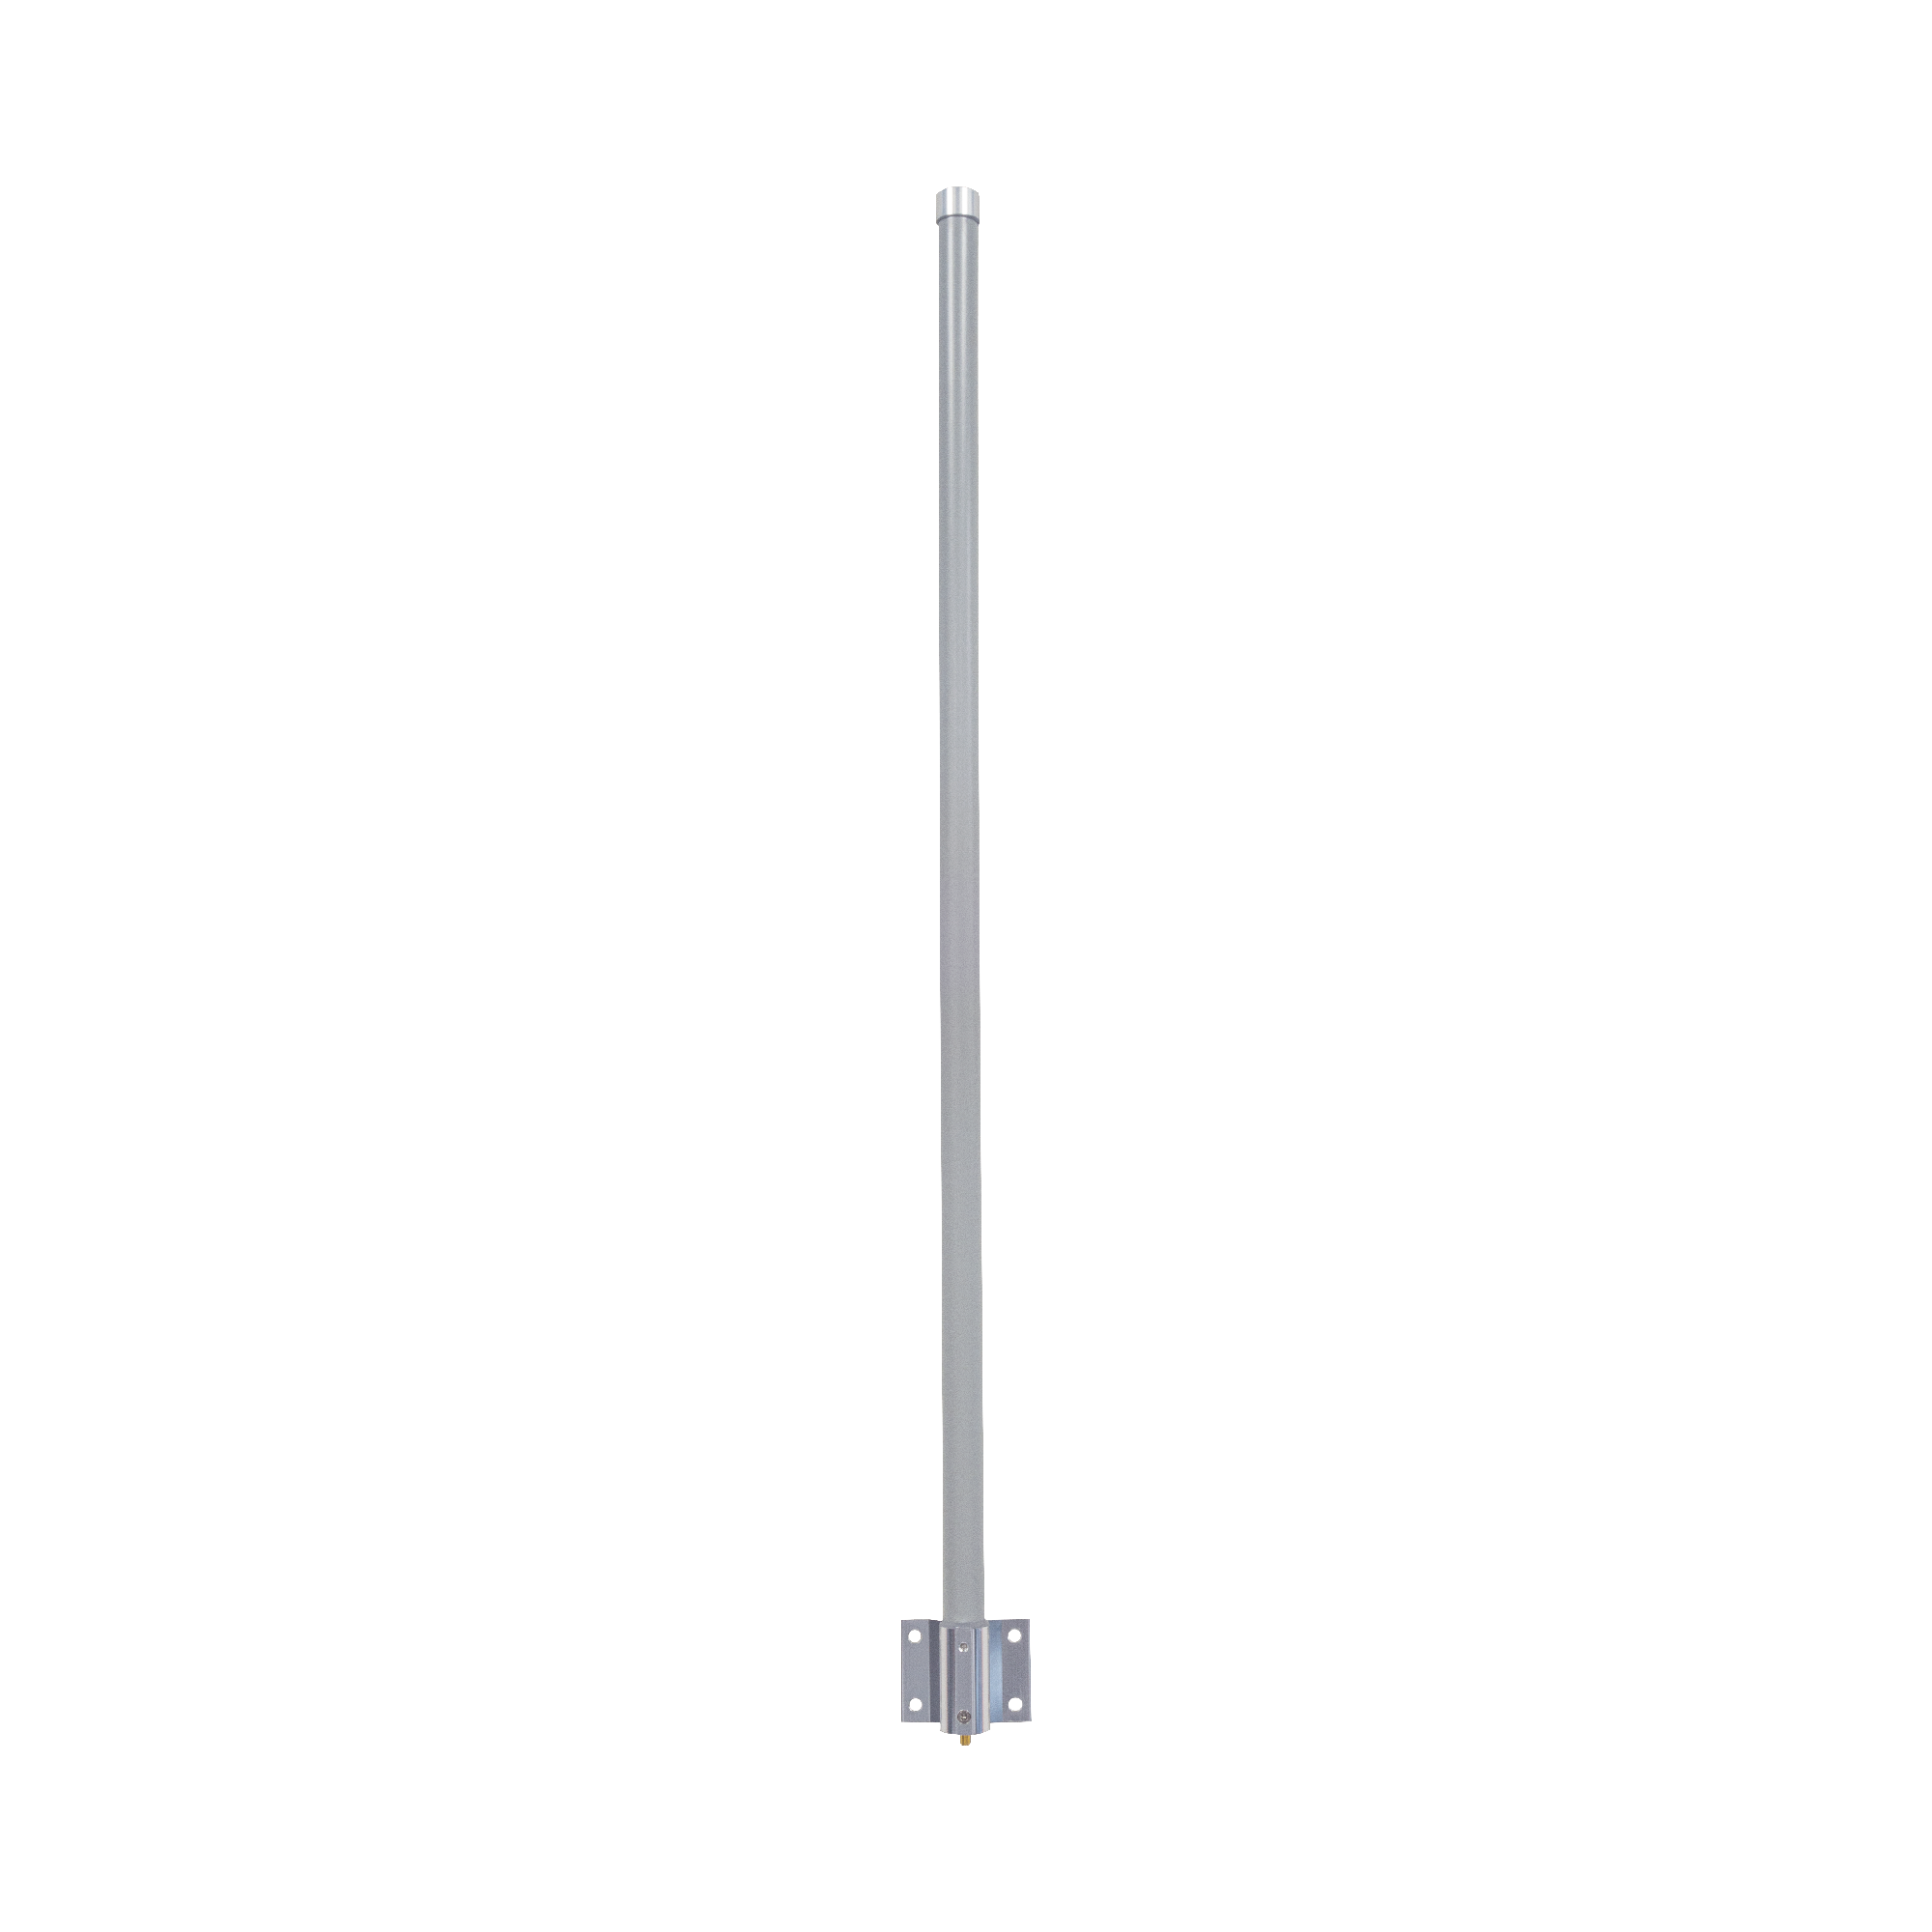 ANTENA OMNIDIRECCIONA LoRa 6.5 dBi 824-960 MHz